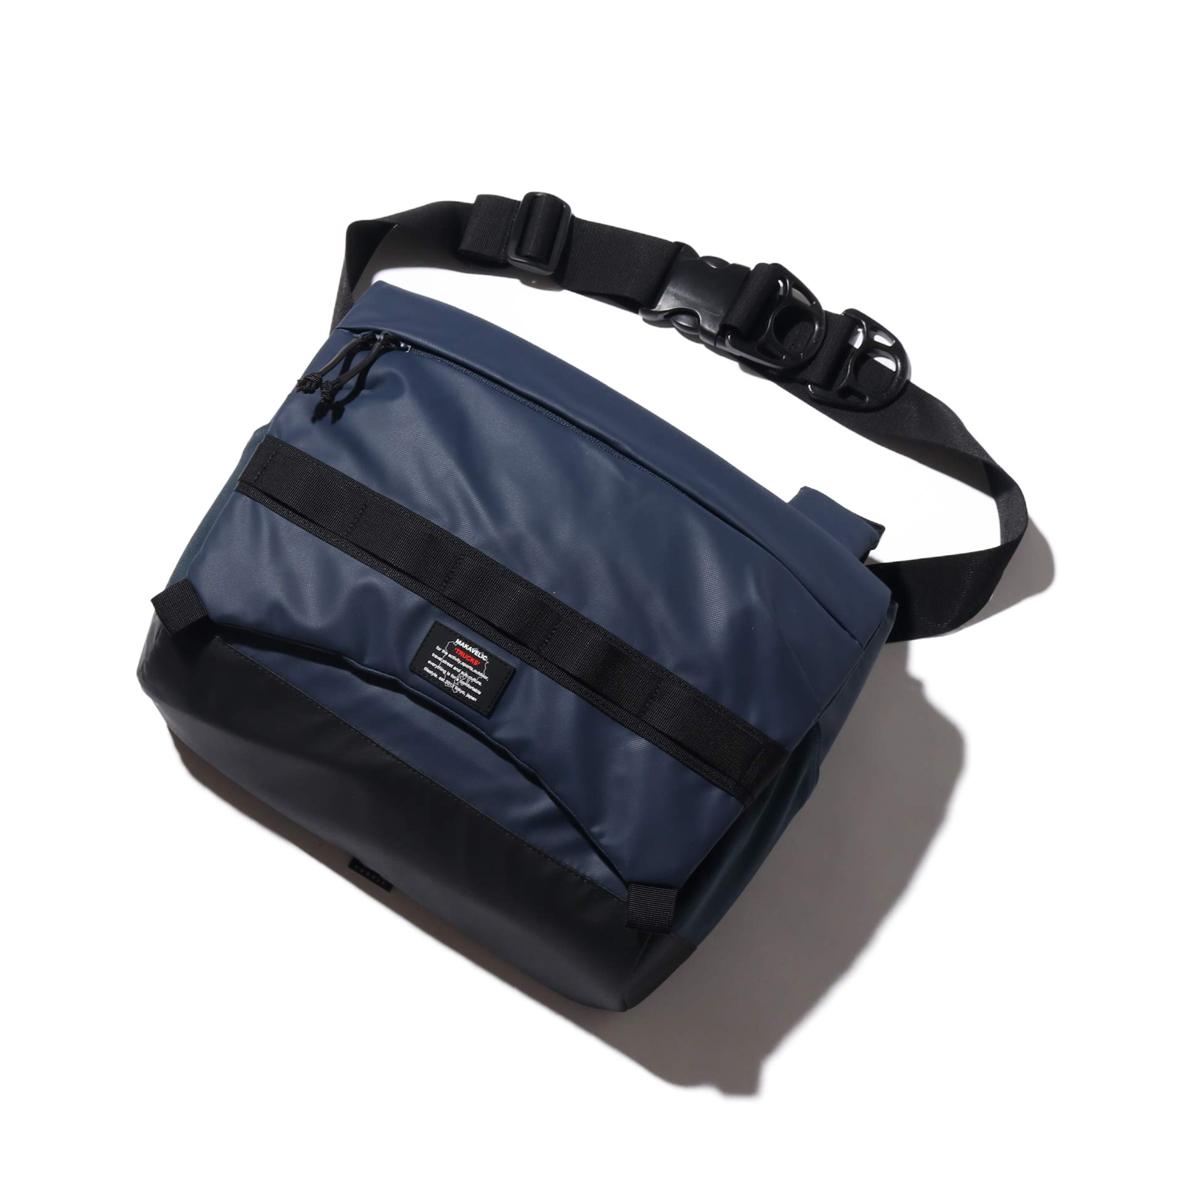 MAKAVELIC RAISE SHOULDER BAG(マキャベリック レイズ ショルダーバッグ)NAVY【メンズ ショルダーバッグ】19FA-I